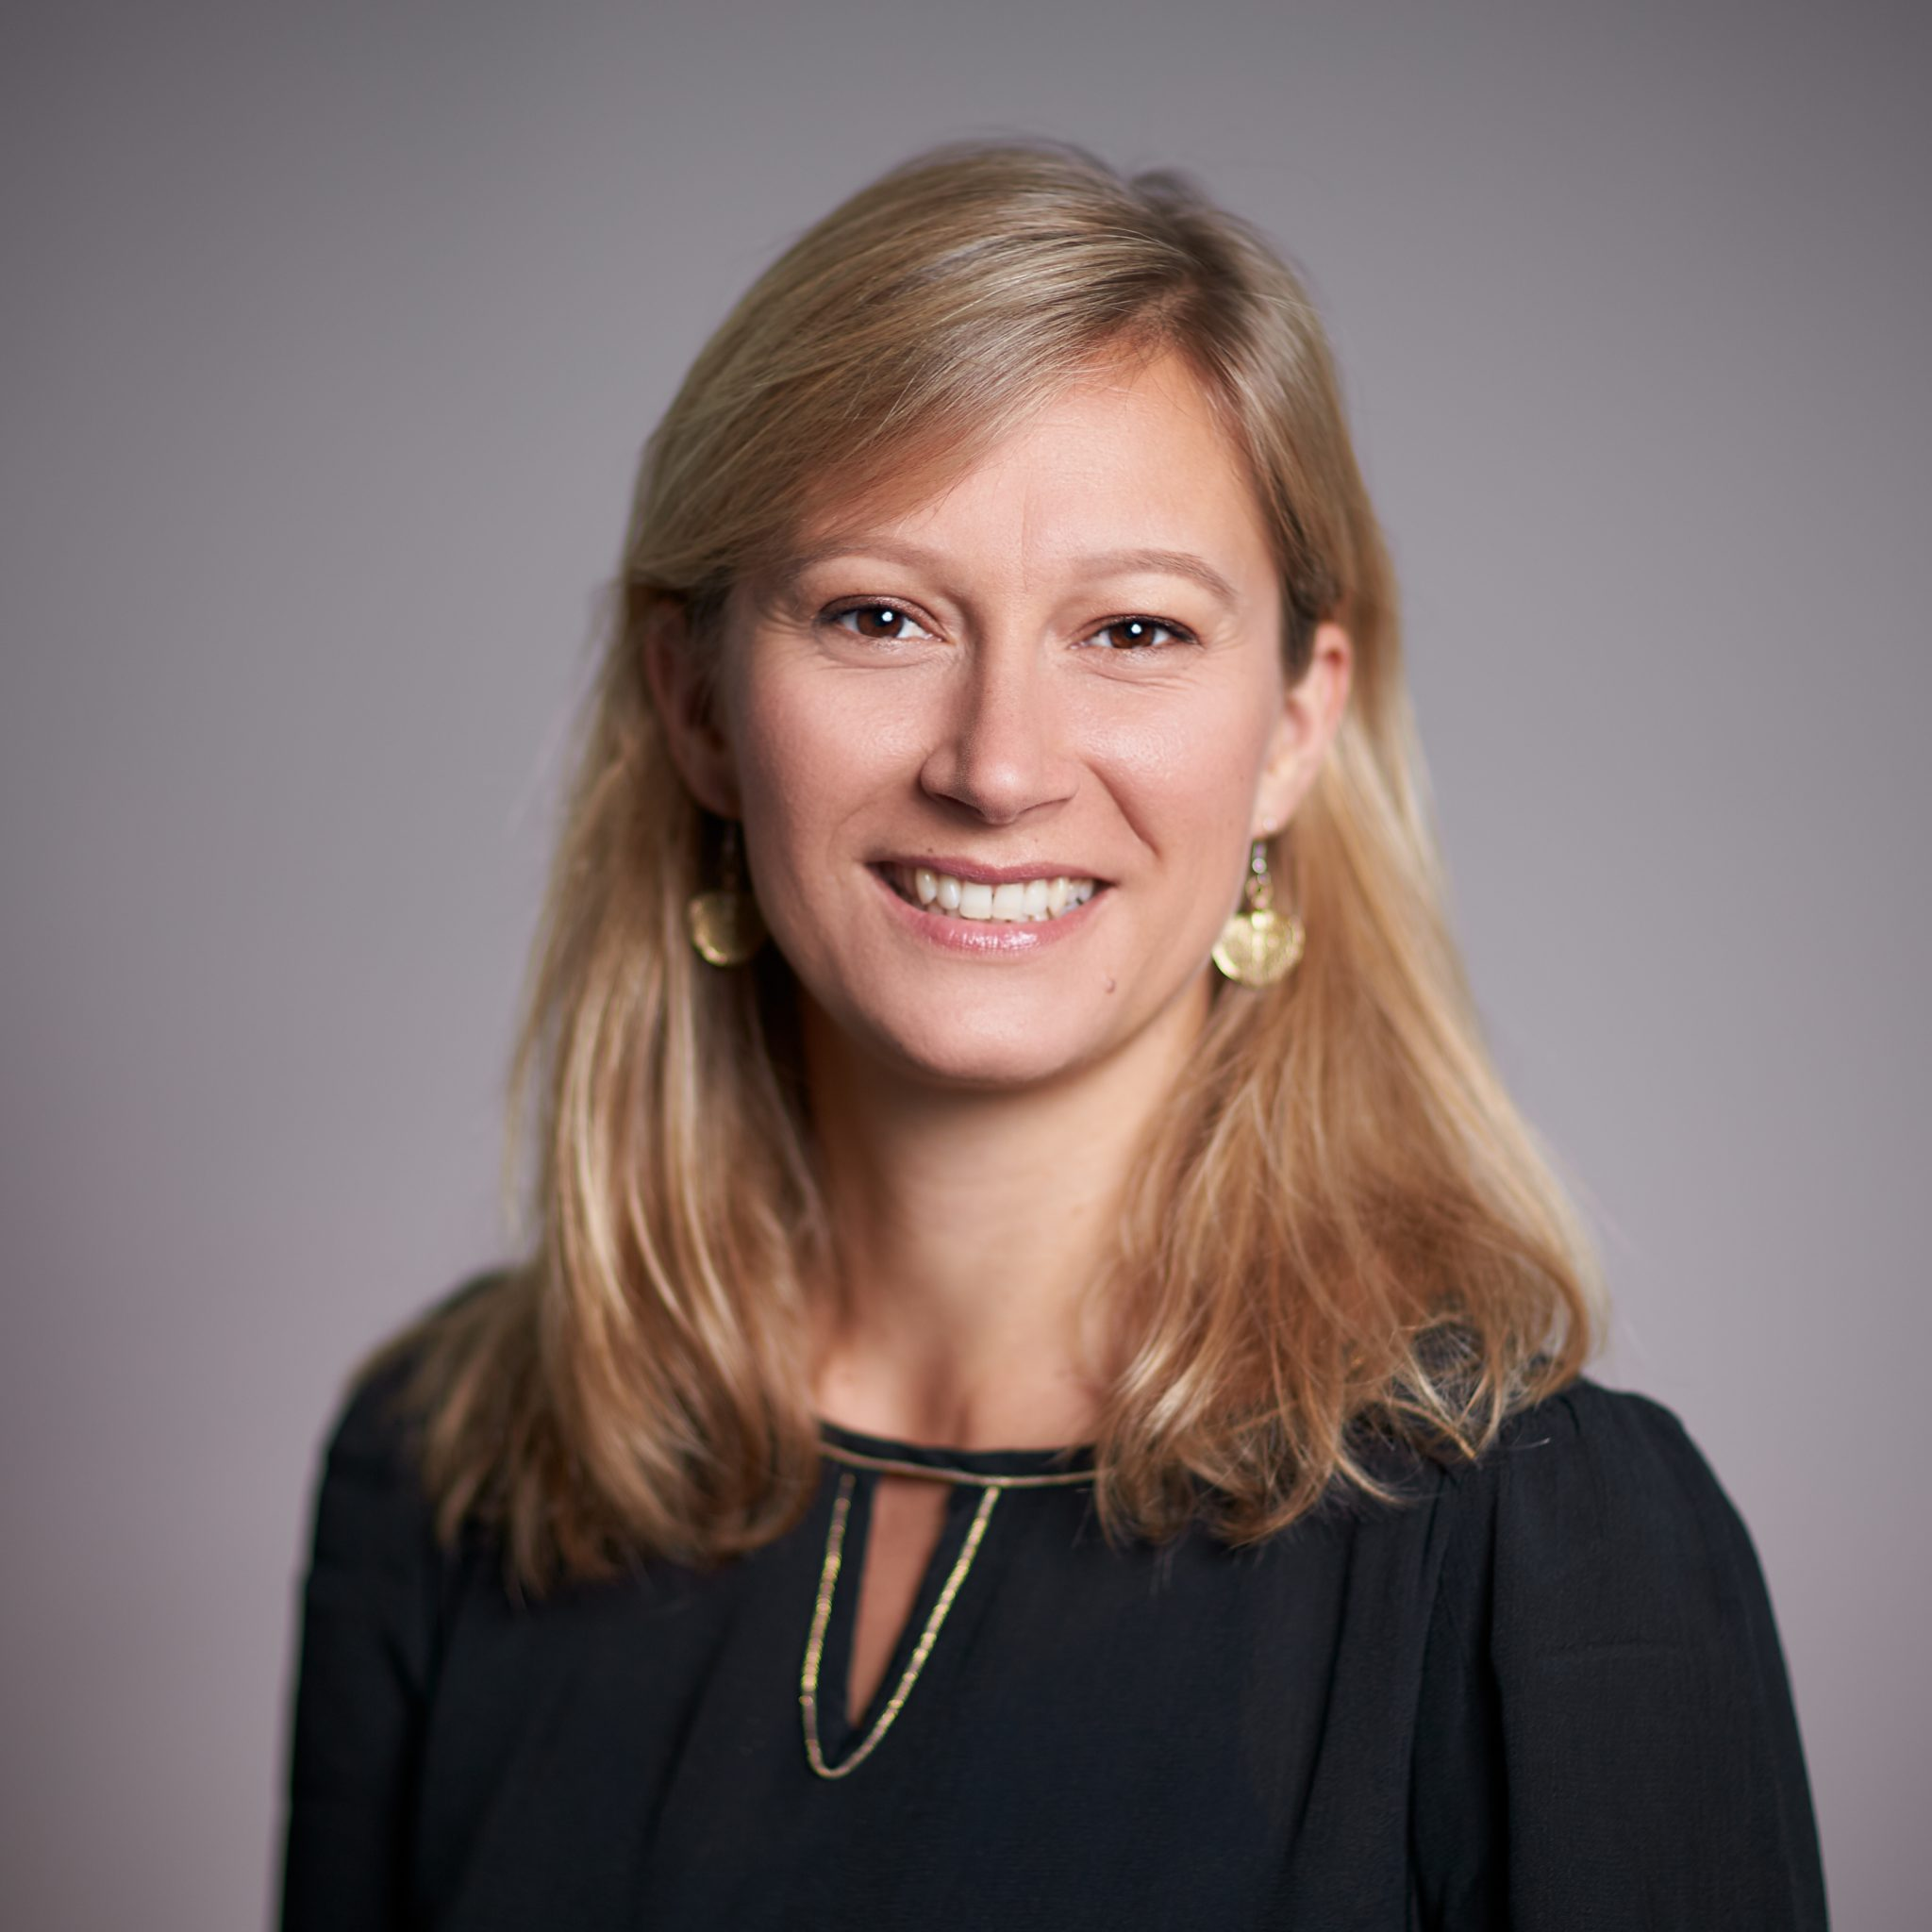 Anne Osdoit, partner at health focused VC Sofinnova Partners.